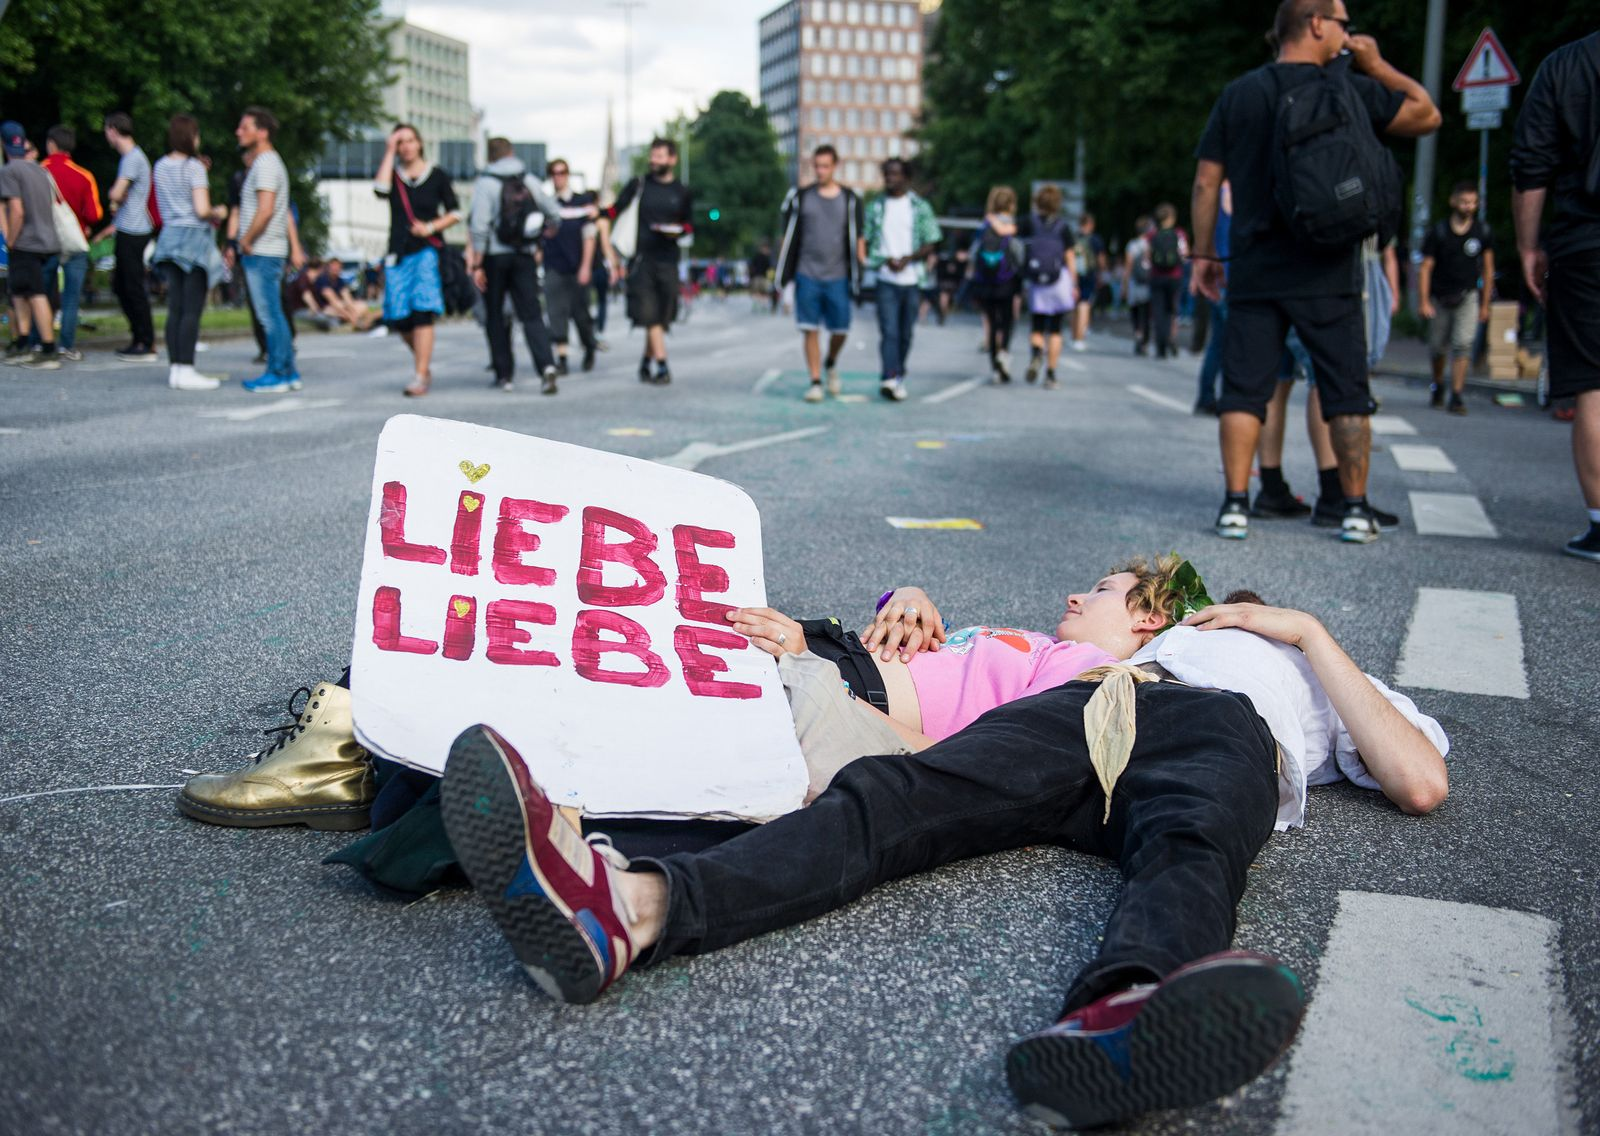 G20-Gipfel - Internationale Demonstration gegen den G20-Gipfel